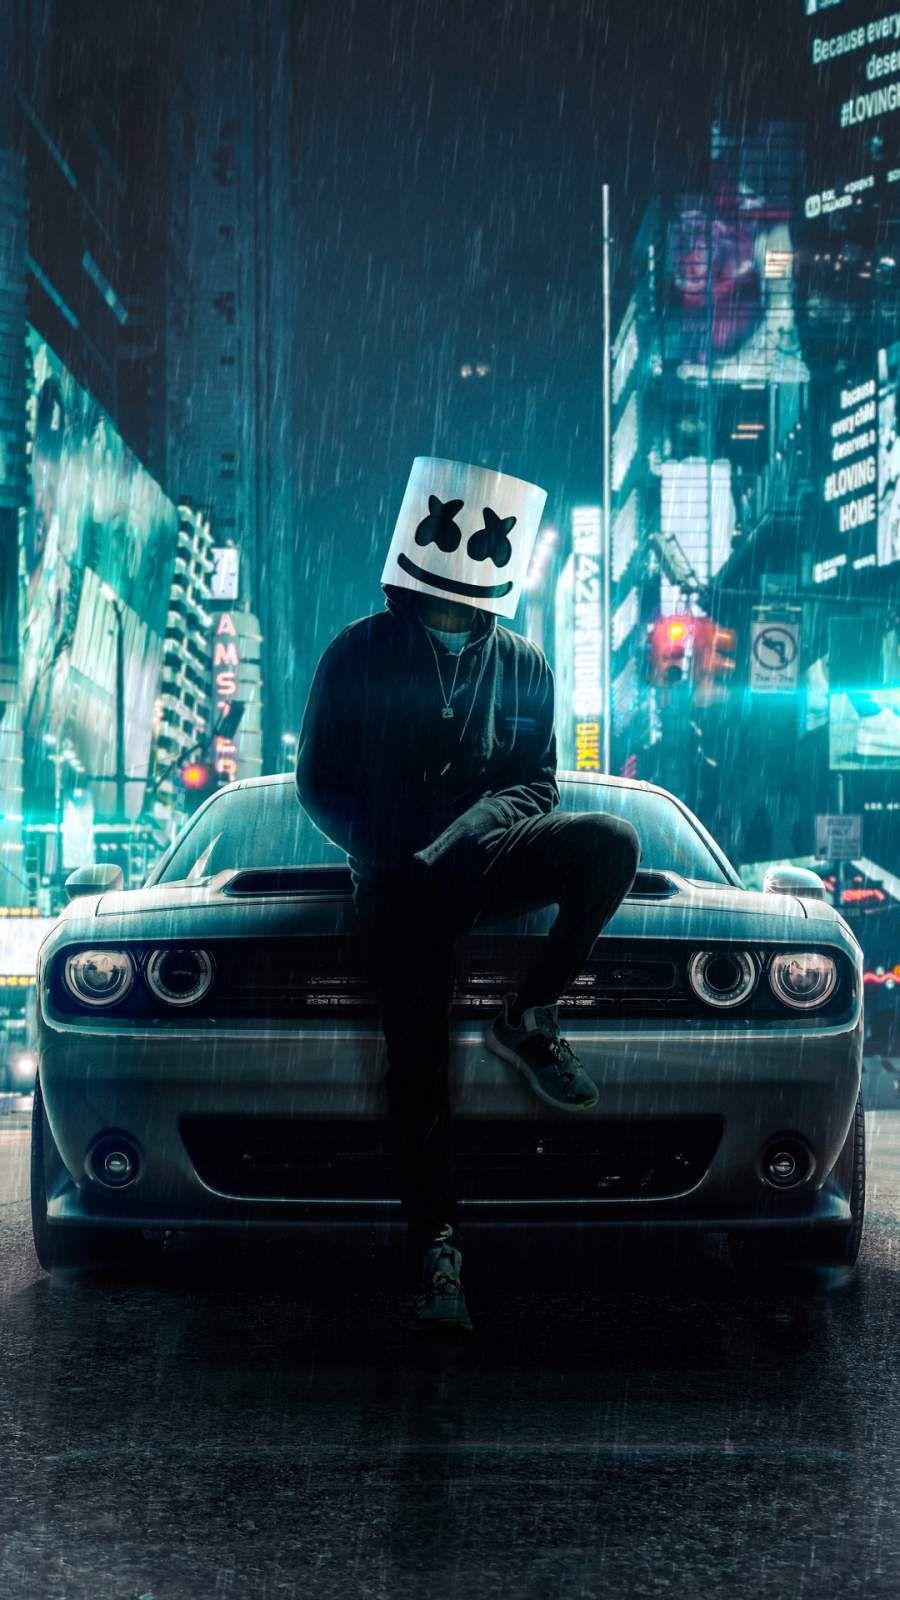 Marshmello Dodge Car Iphone Wallpaper In 2020 Car Iphone